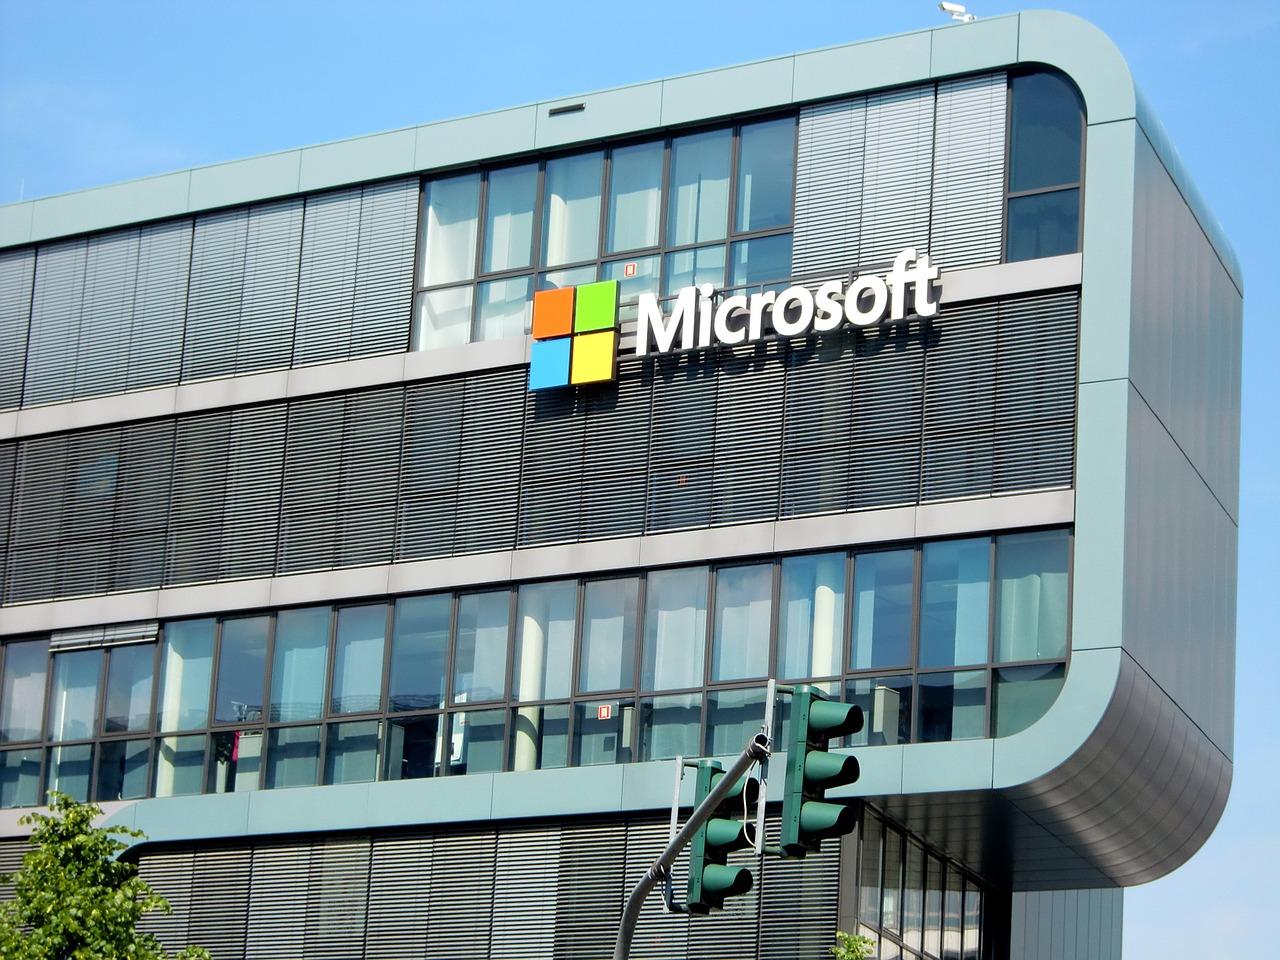 Microsoft inks $5B cloud partnership deal with KPMG